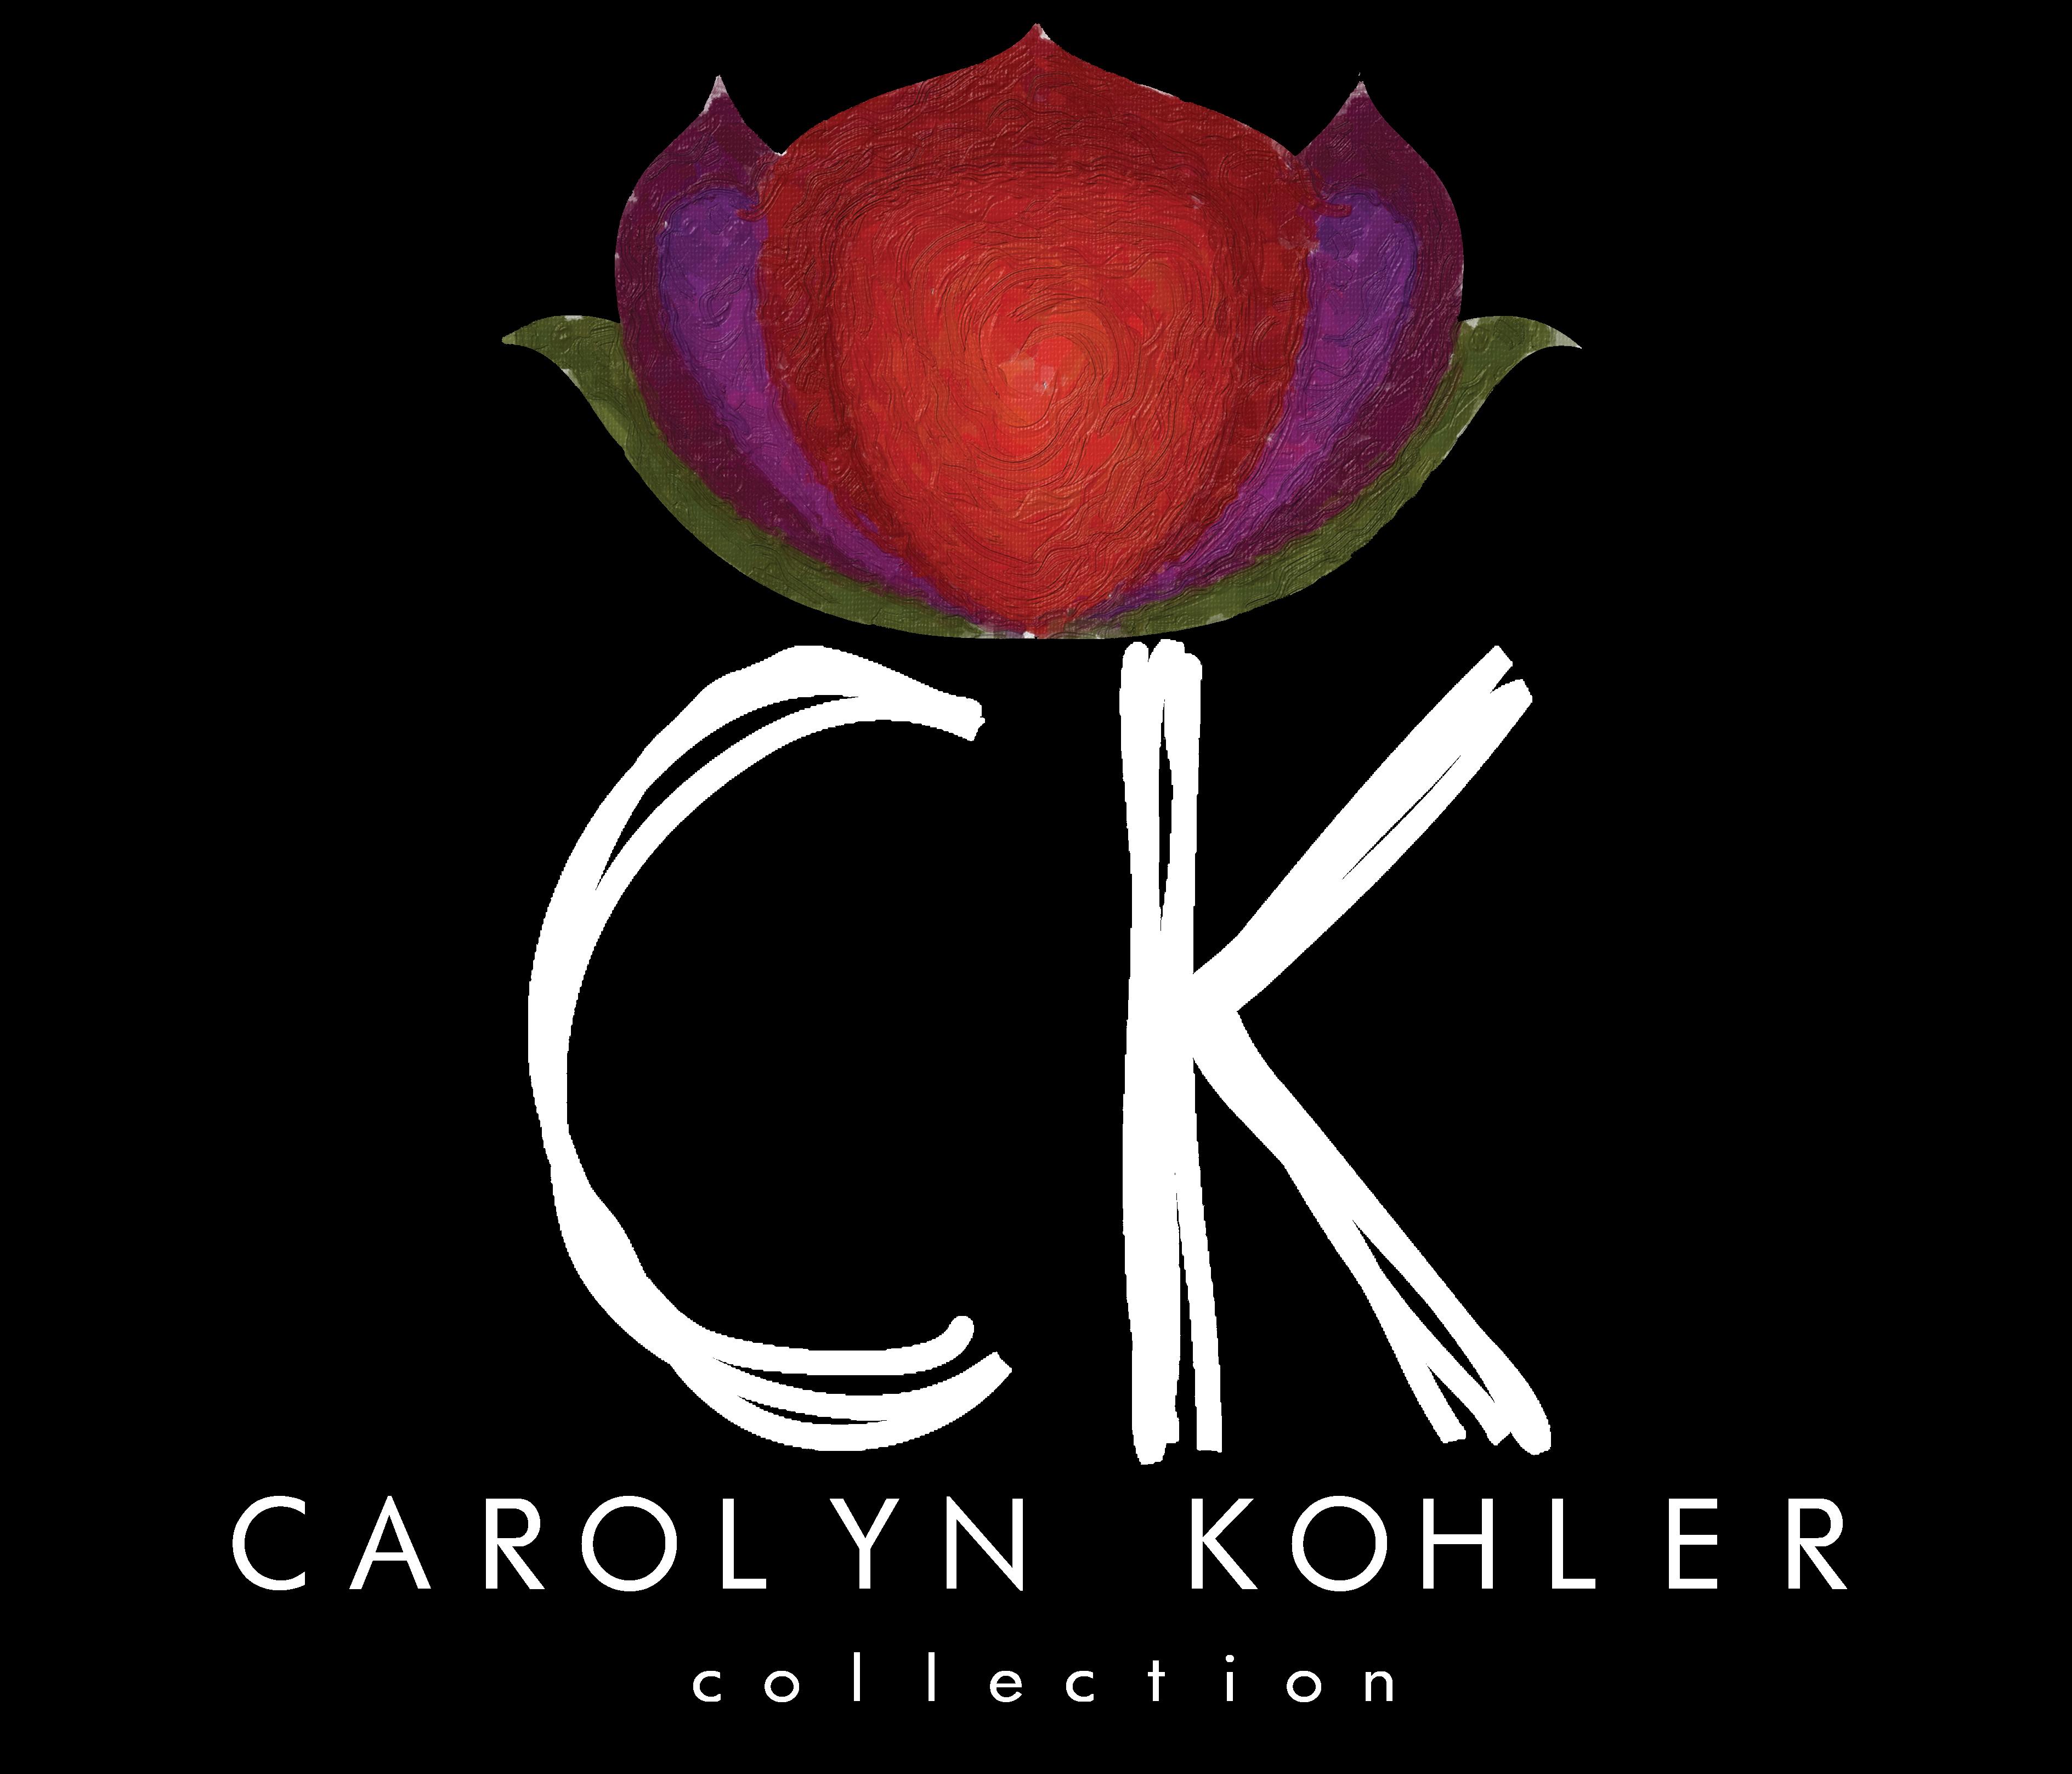 Carolyn Kohler Collection